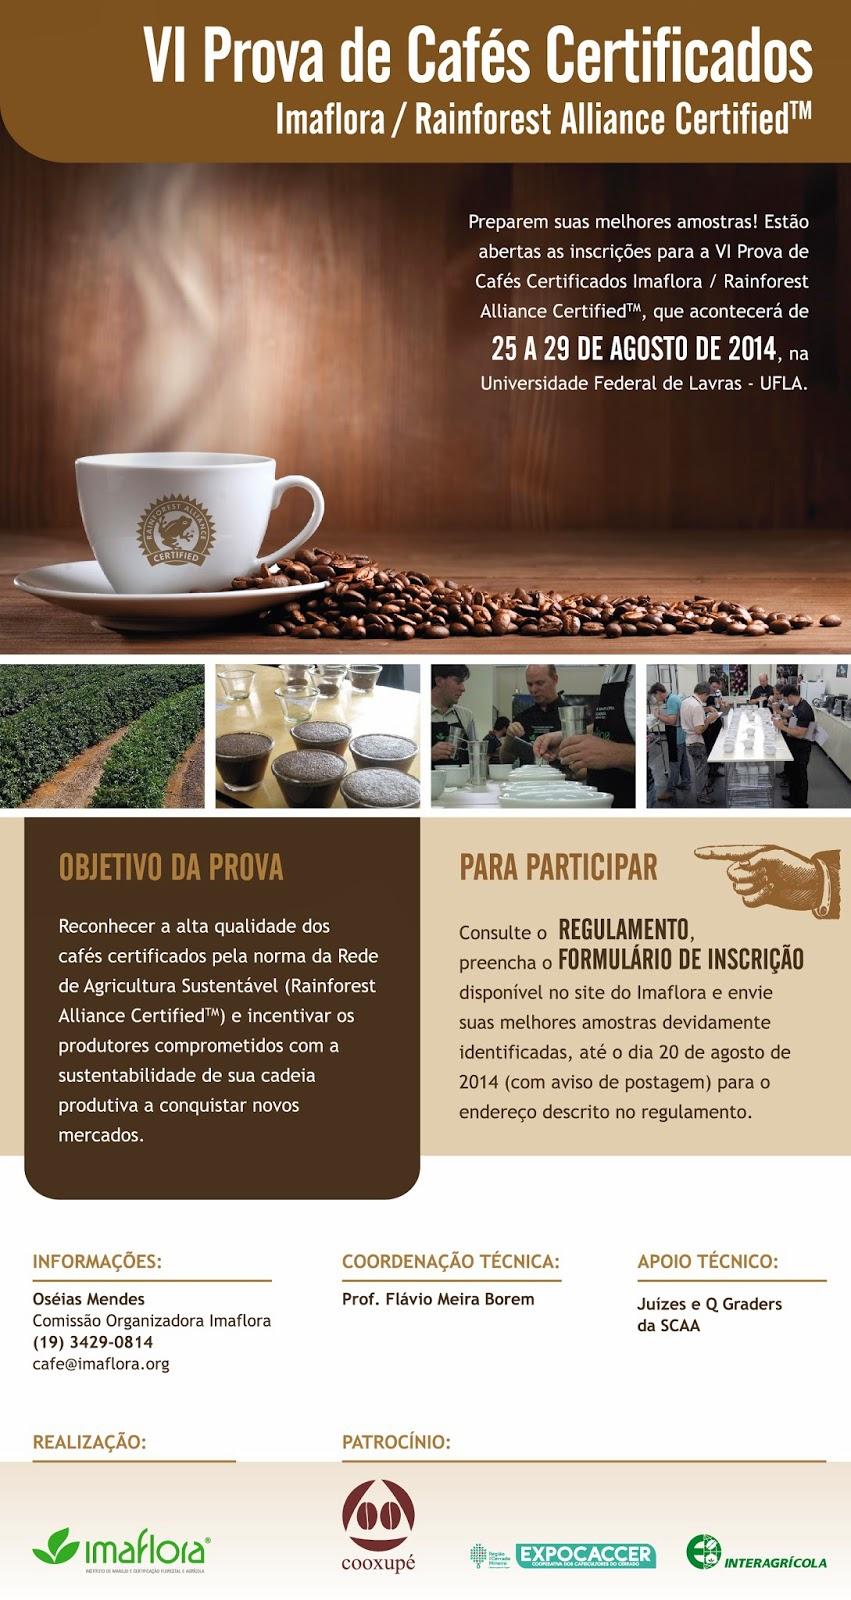 VI Prova de Cafés Certificados Imaflora / Rainforest Alliance CertifiedTM